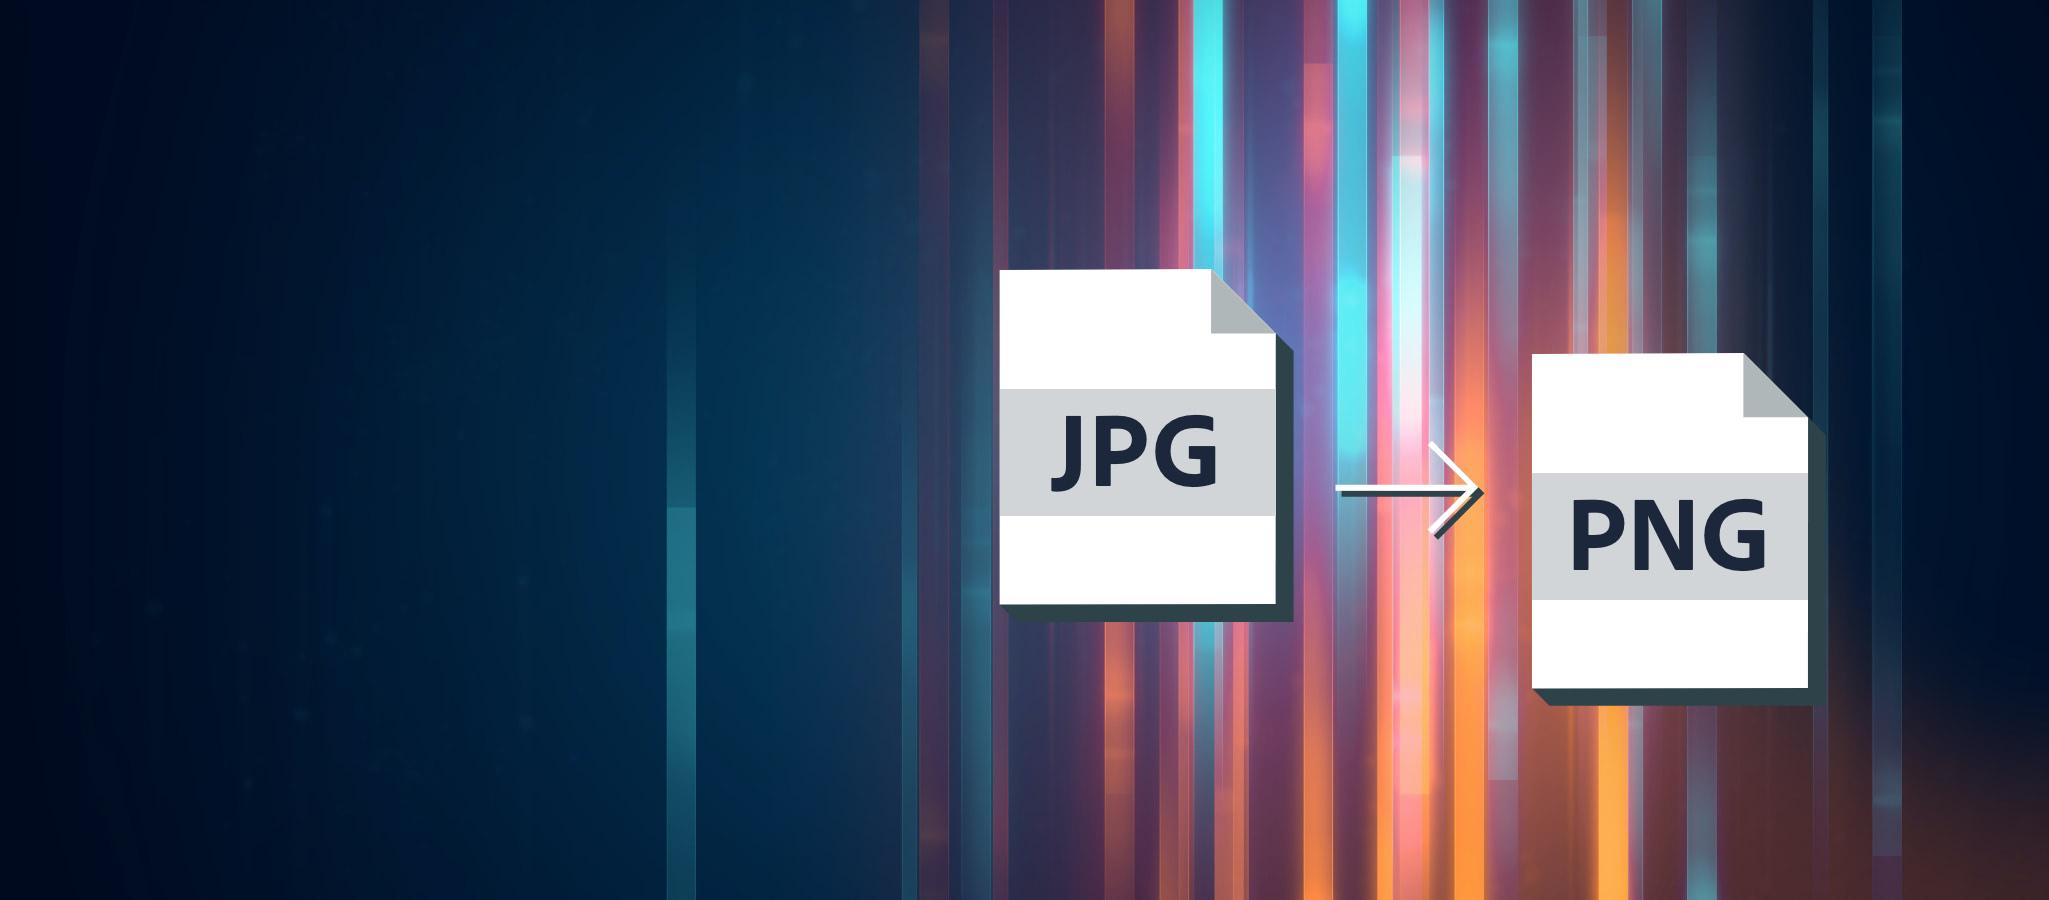 Convert Jpg To Png Adobe Photoshop Express